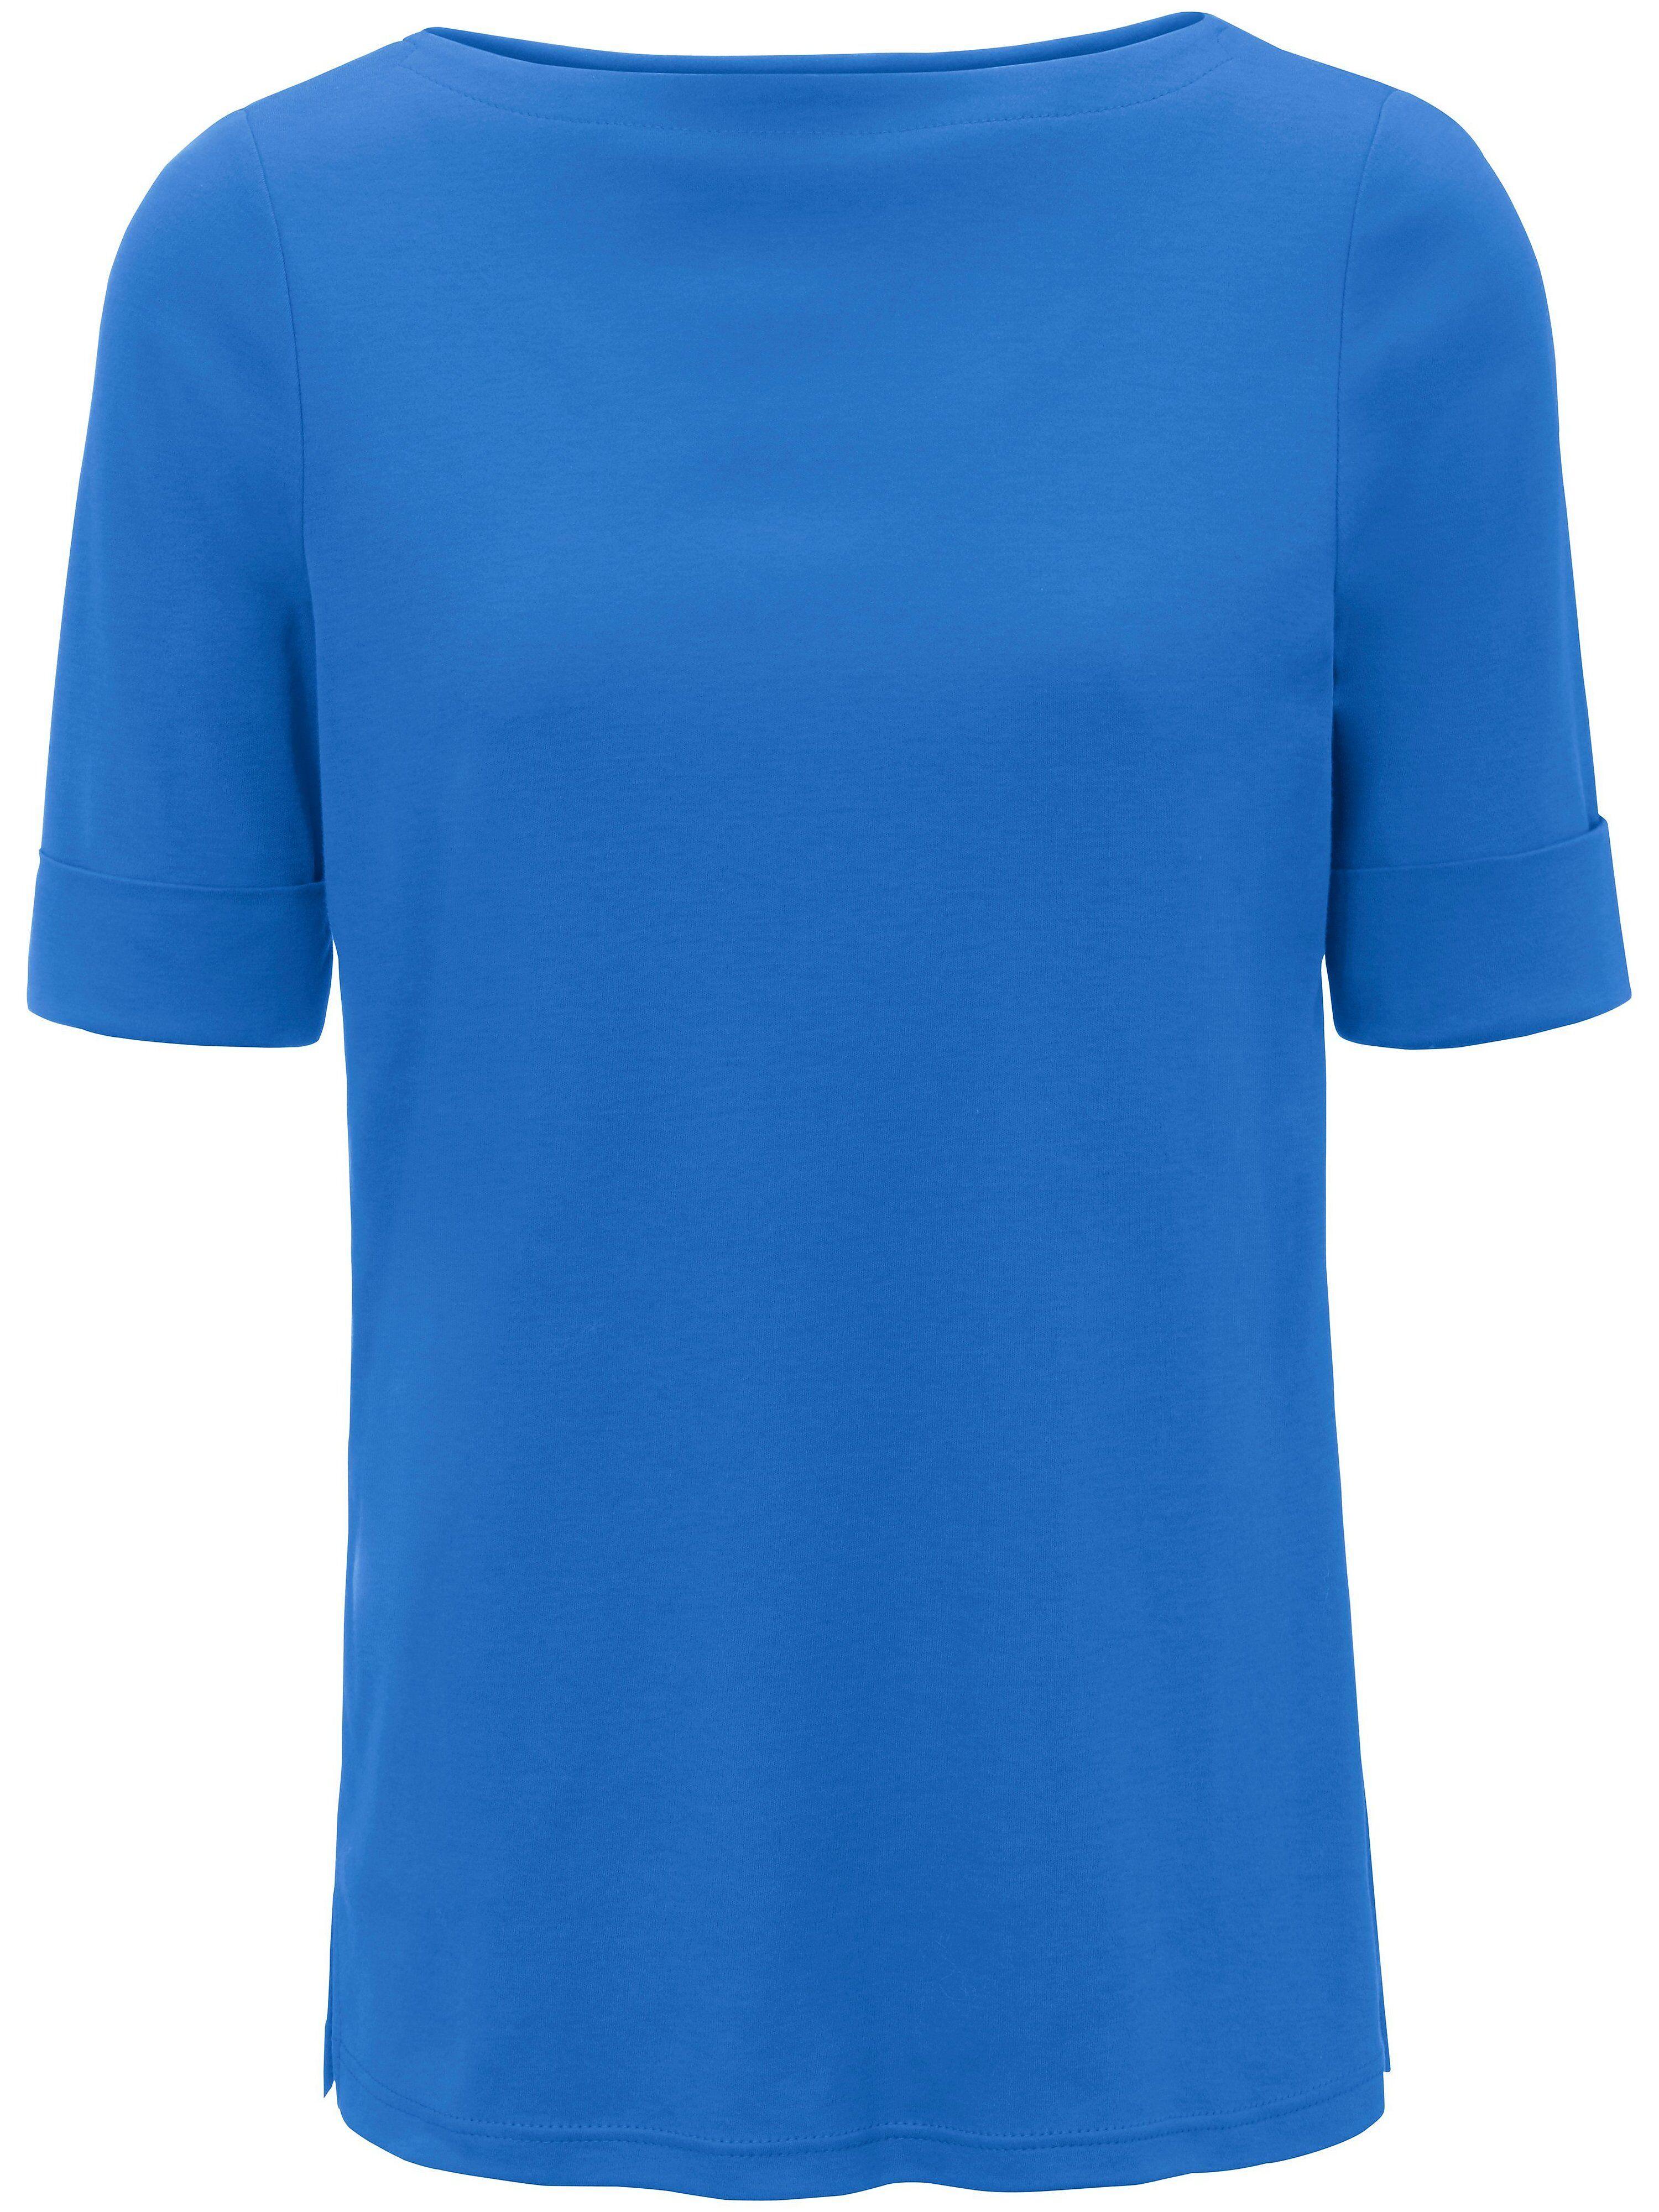 Efixelle Le T-shirt 100% coton  Efixelle bleu  - Femme - 40